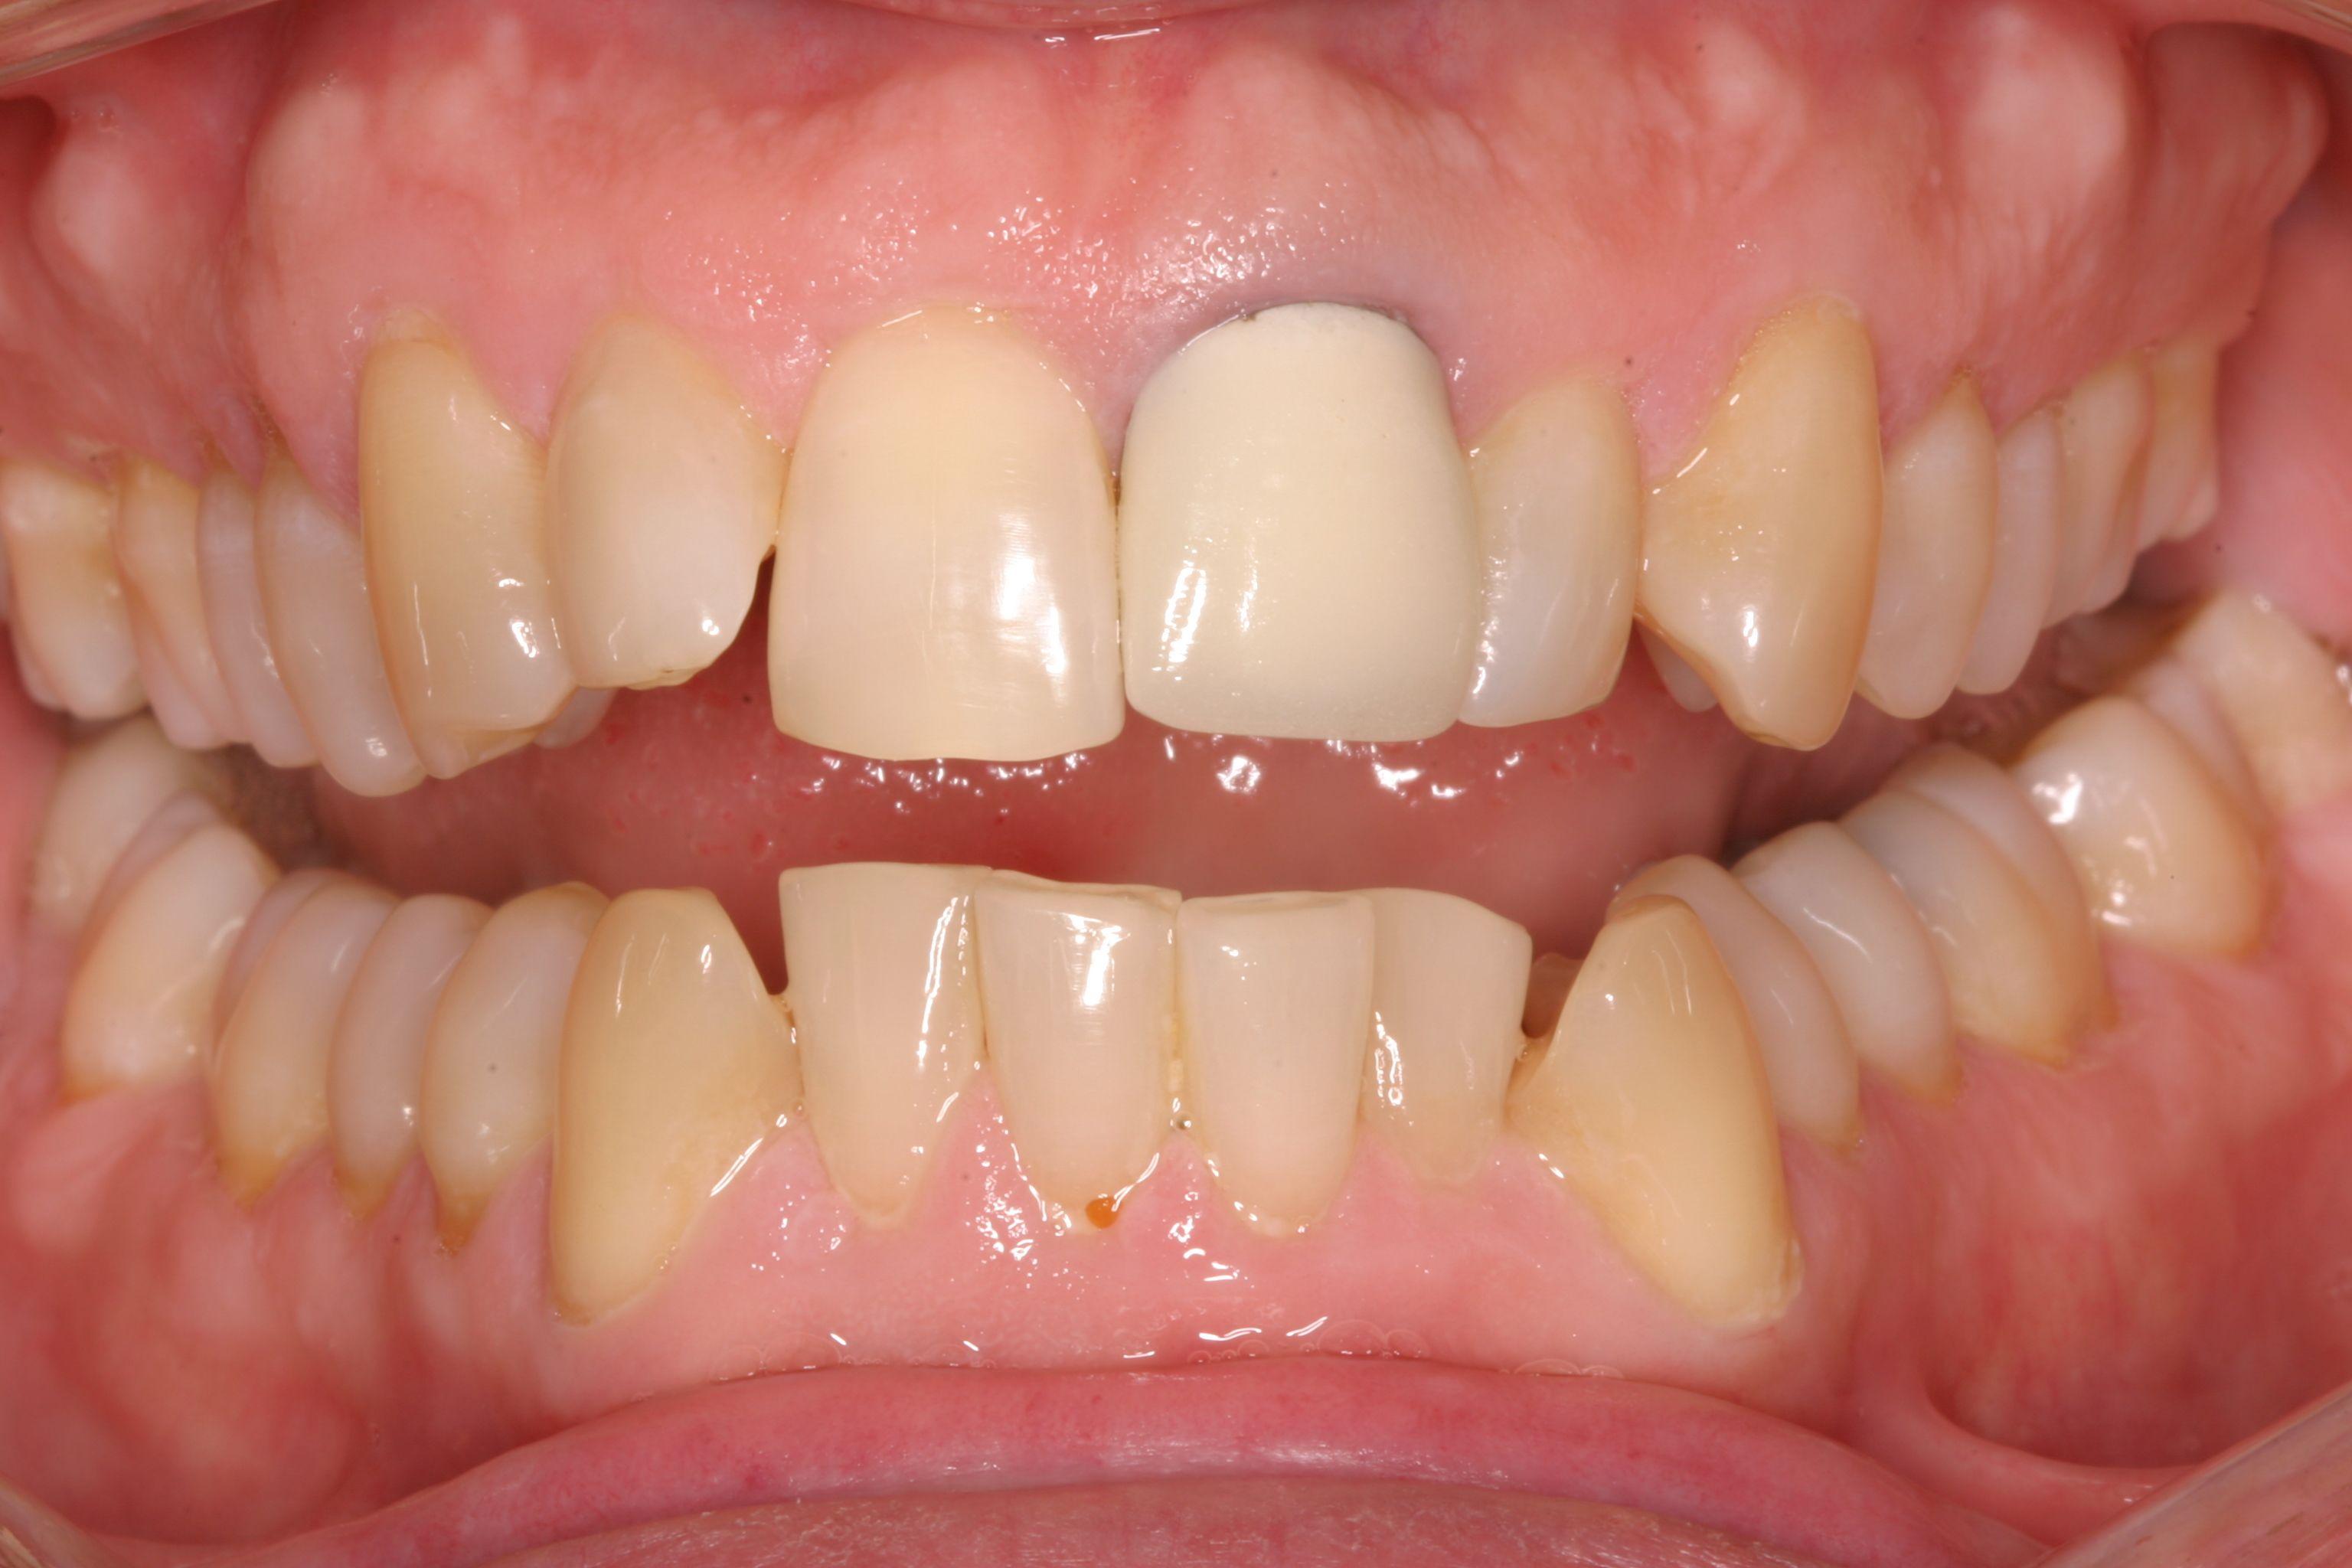 Metal Ceramic Crowns Placed On Anterior Teeth Can Appear Dark Around The Crown Margin This Is The Metal Cap Showing Thr Teeth Remedies Porcelain Crowns Dental